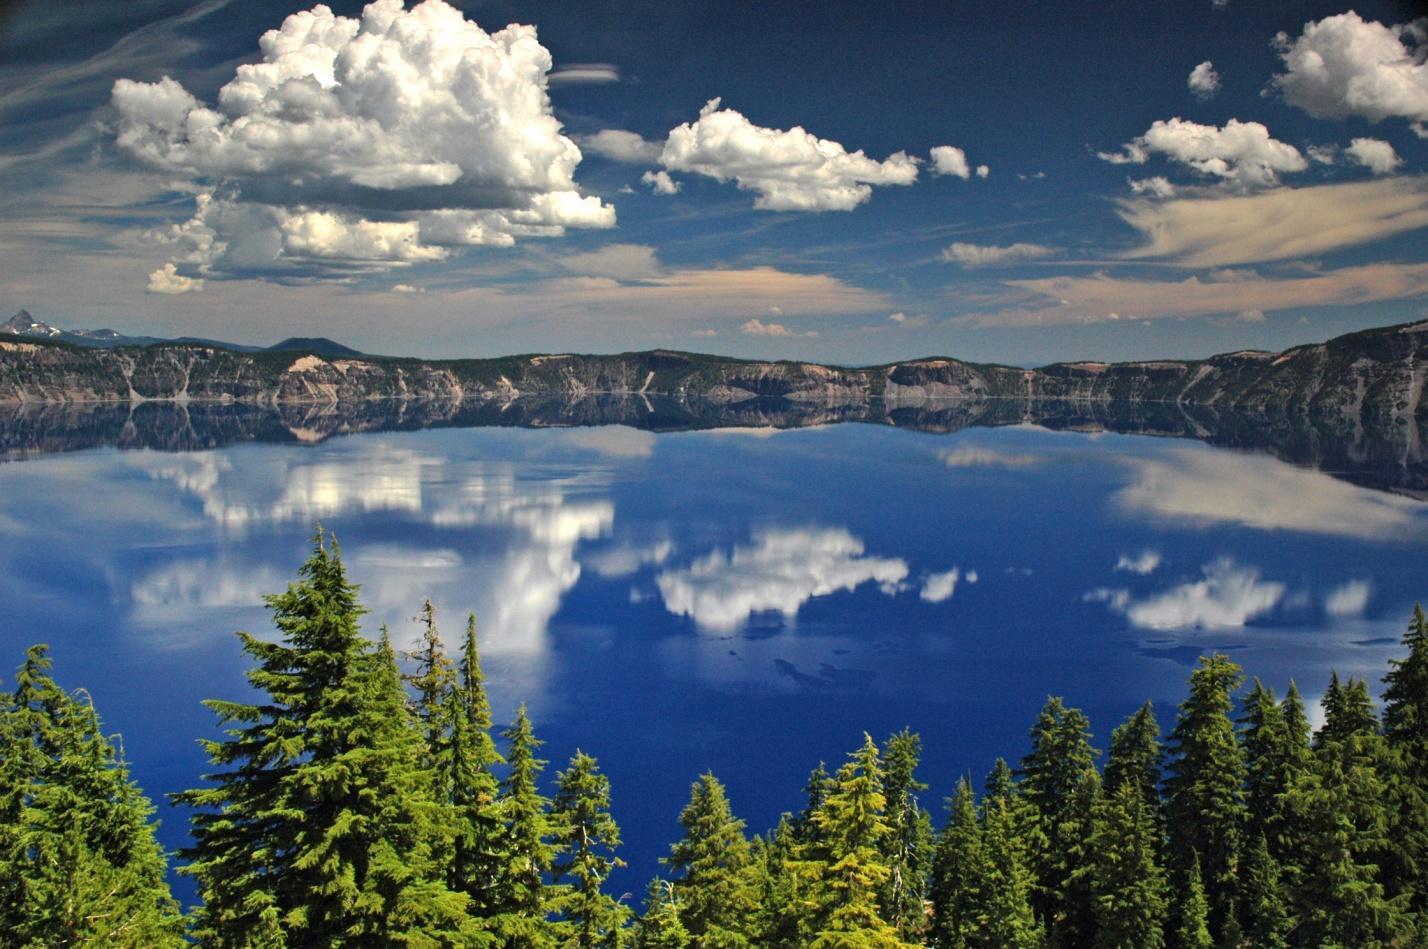 C:\Documents and Settings\Admin\Рабочий стол\Crater_Lake_National_Park_Oregon.jpg